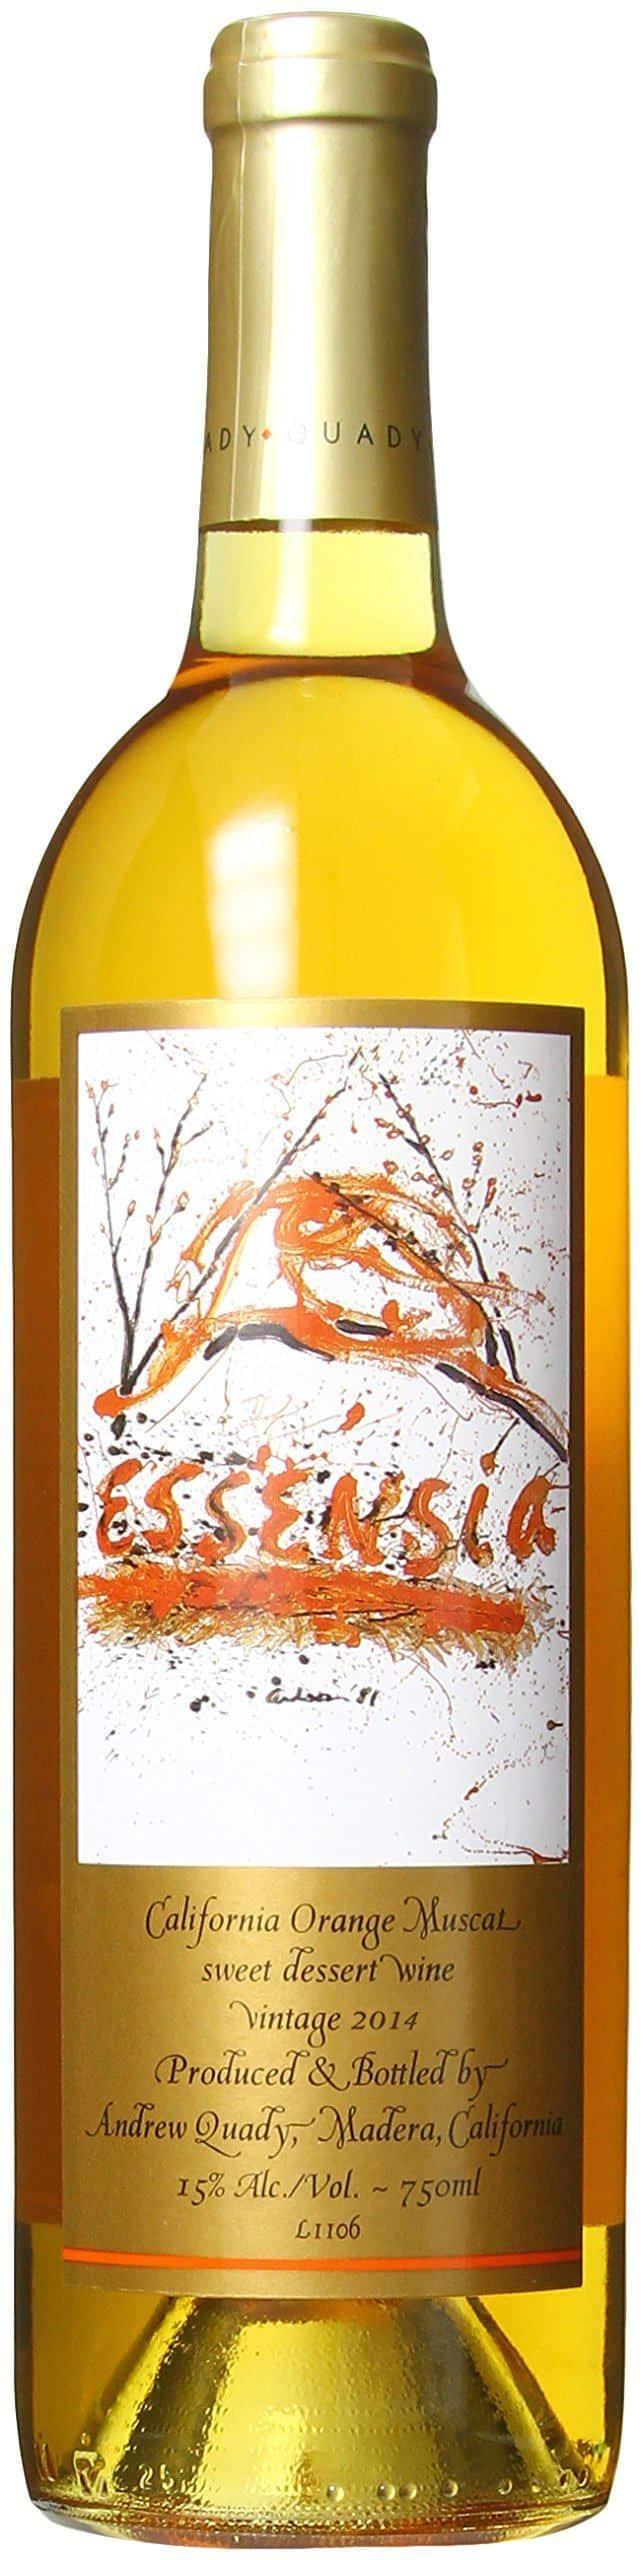 2014 Quady Essensia Orange Muscat Wine